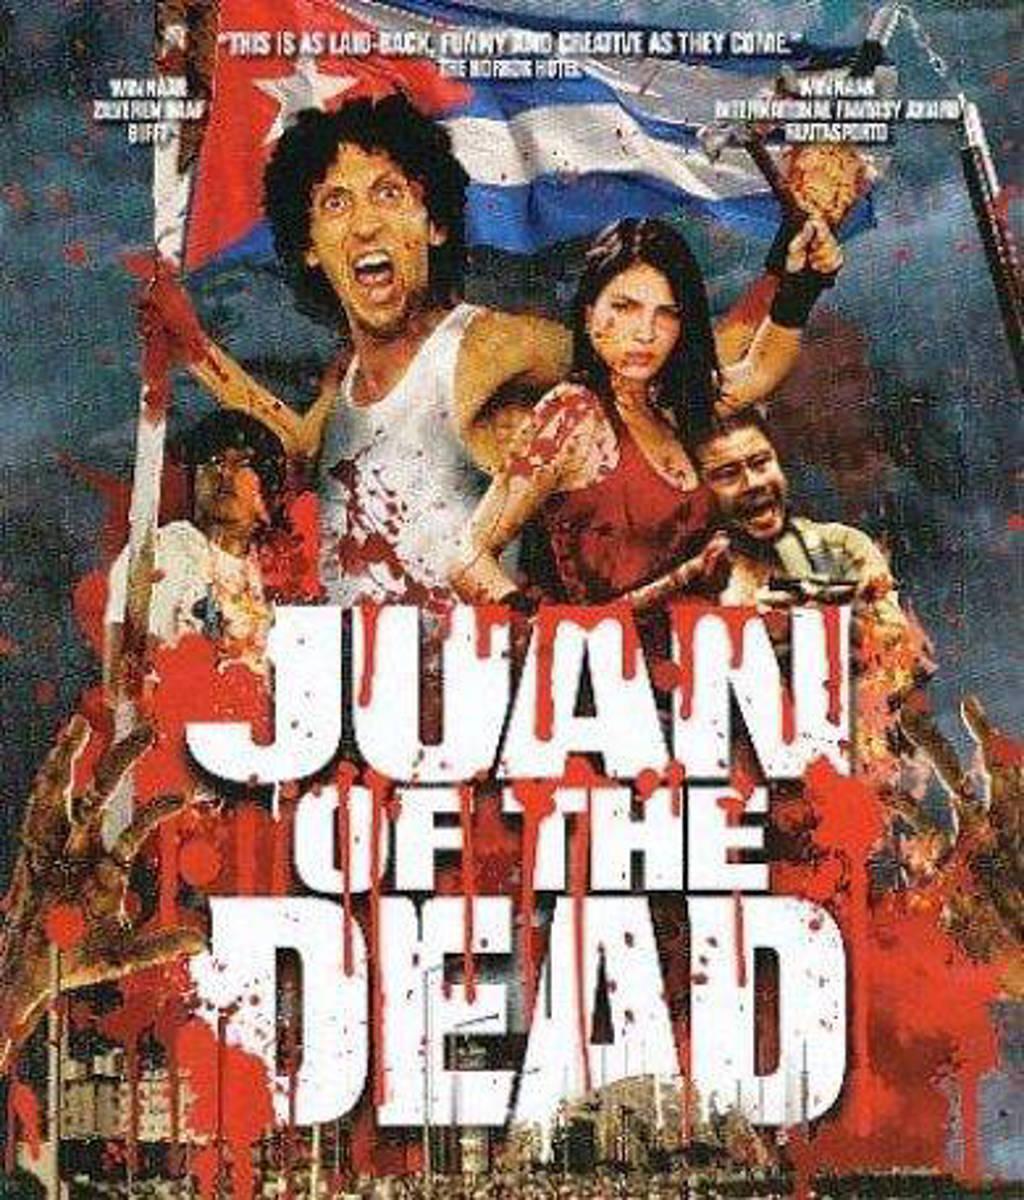 Juan of the dead (Blu-ray)